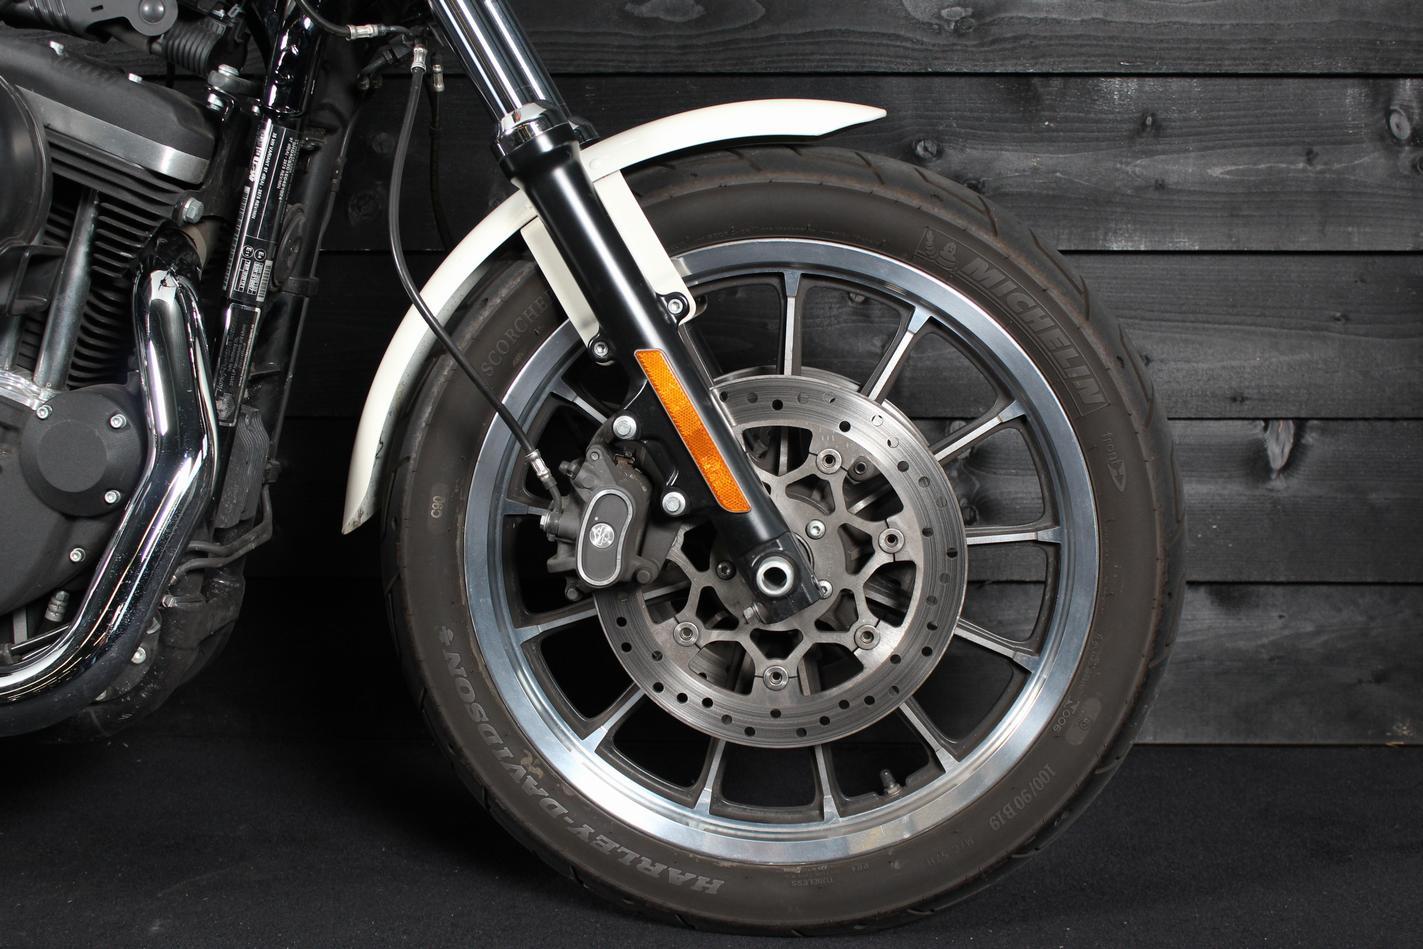 HARLEY-DAVIDSON - XL 883 Roadster